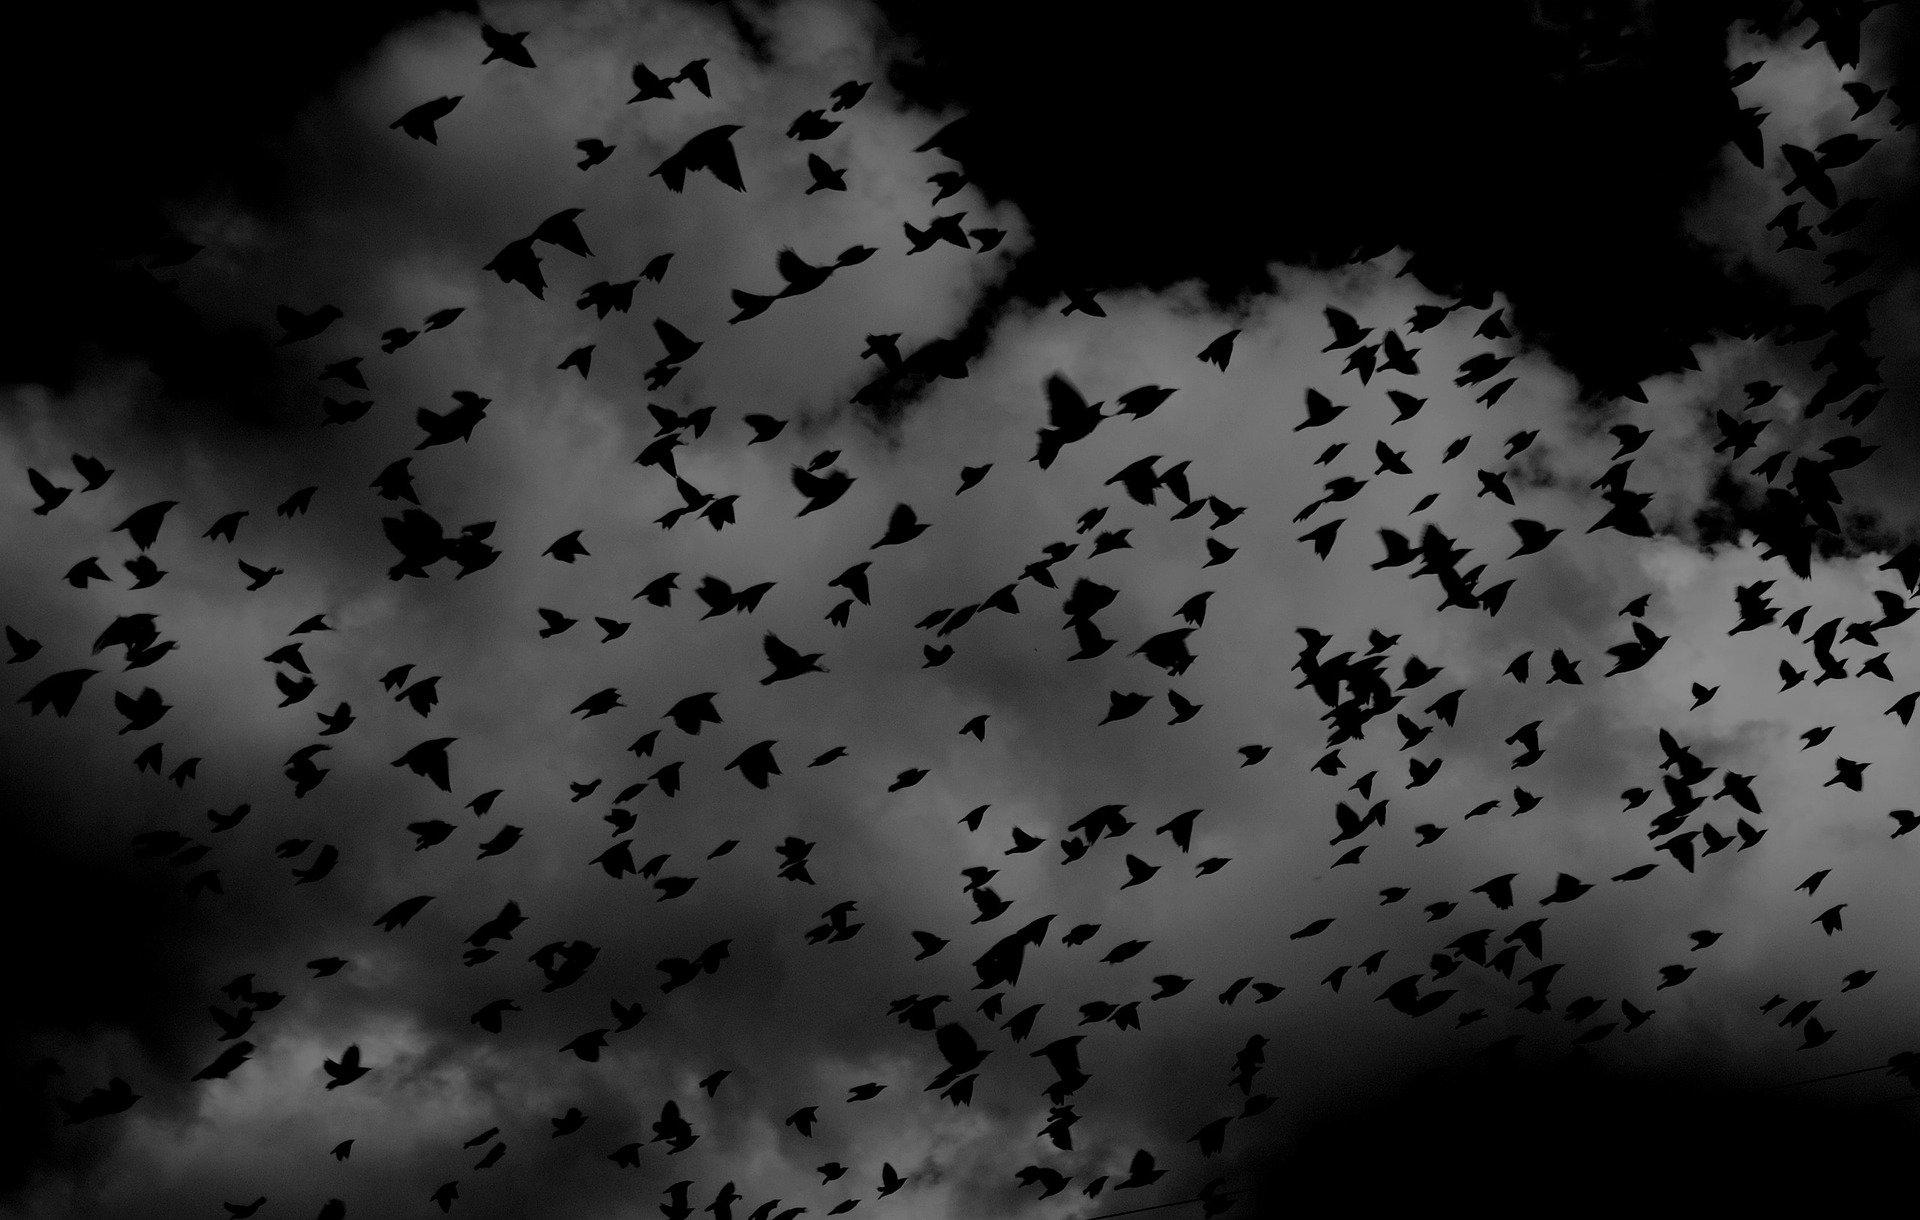 birds-691274_1920